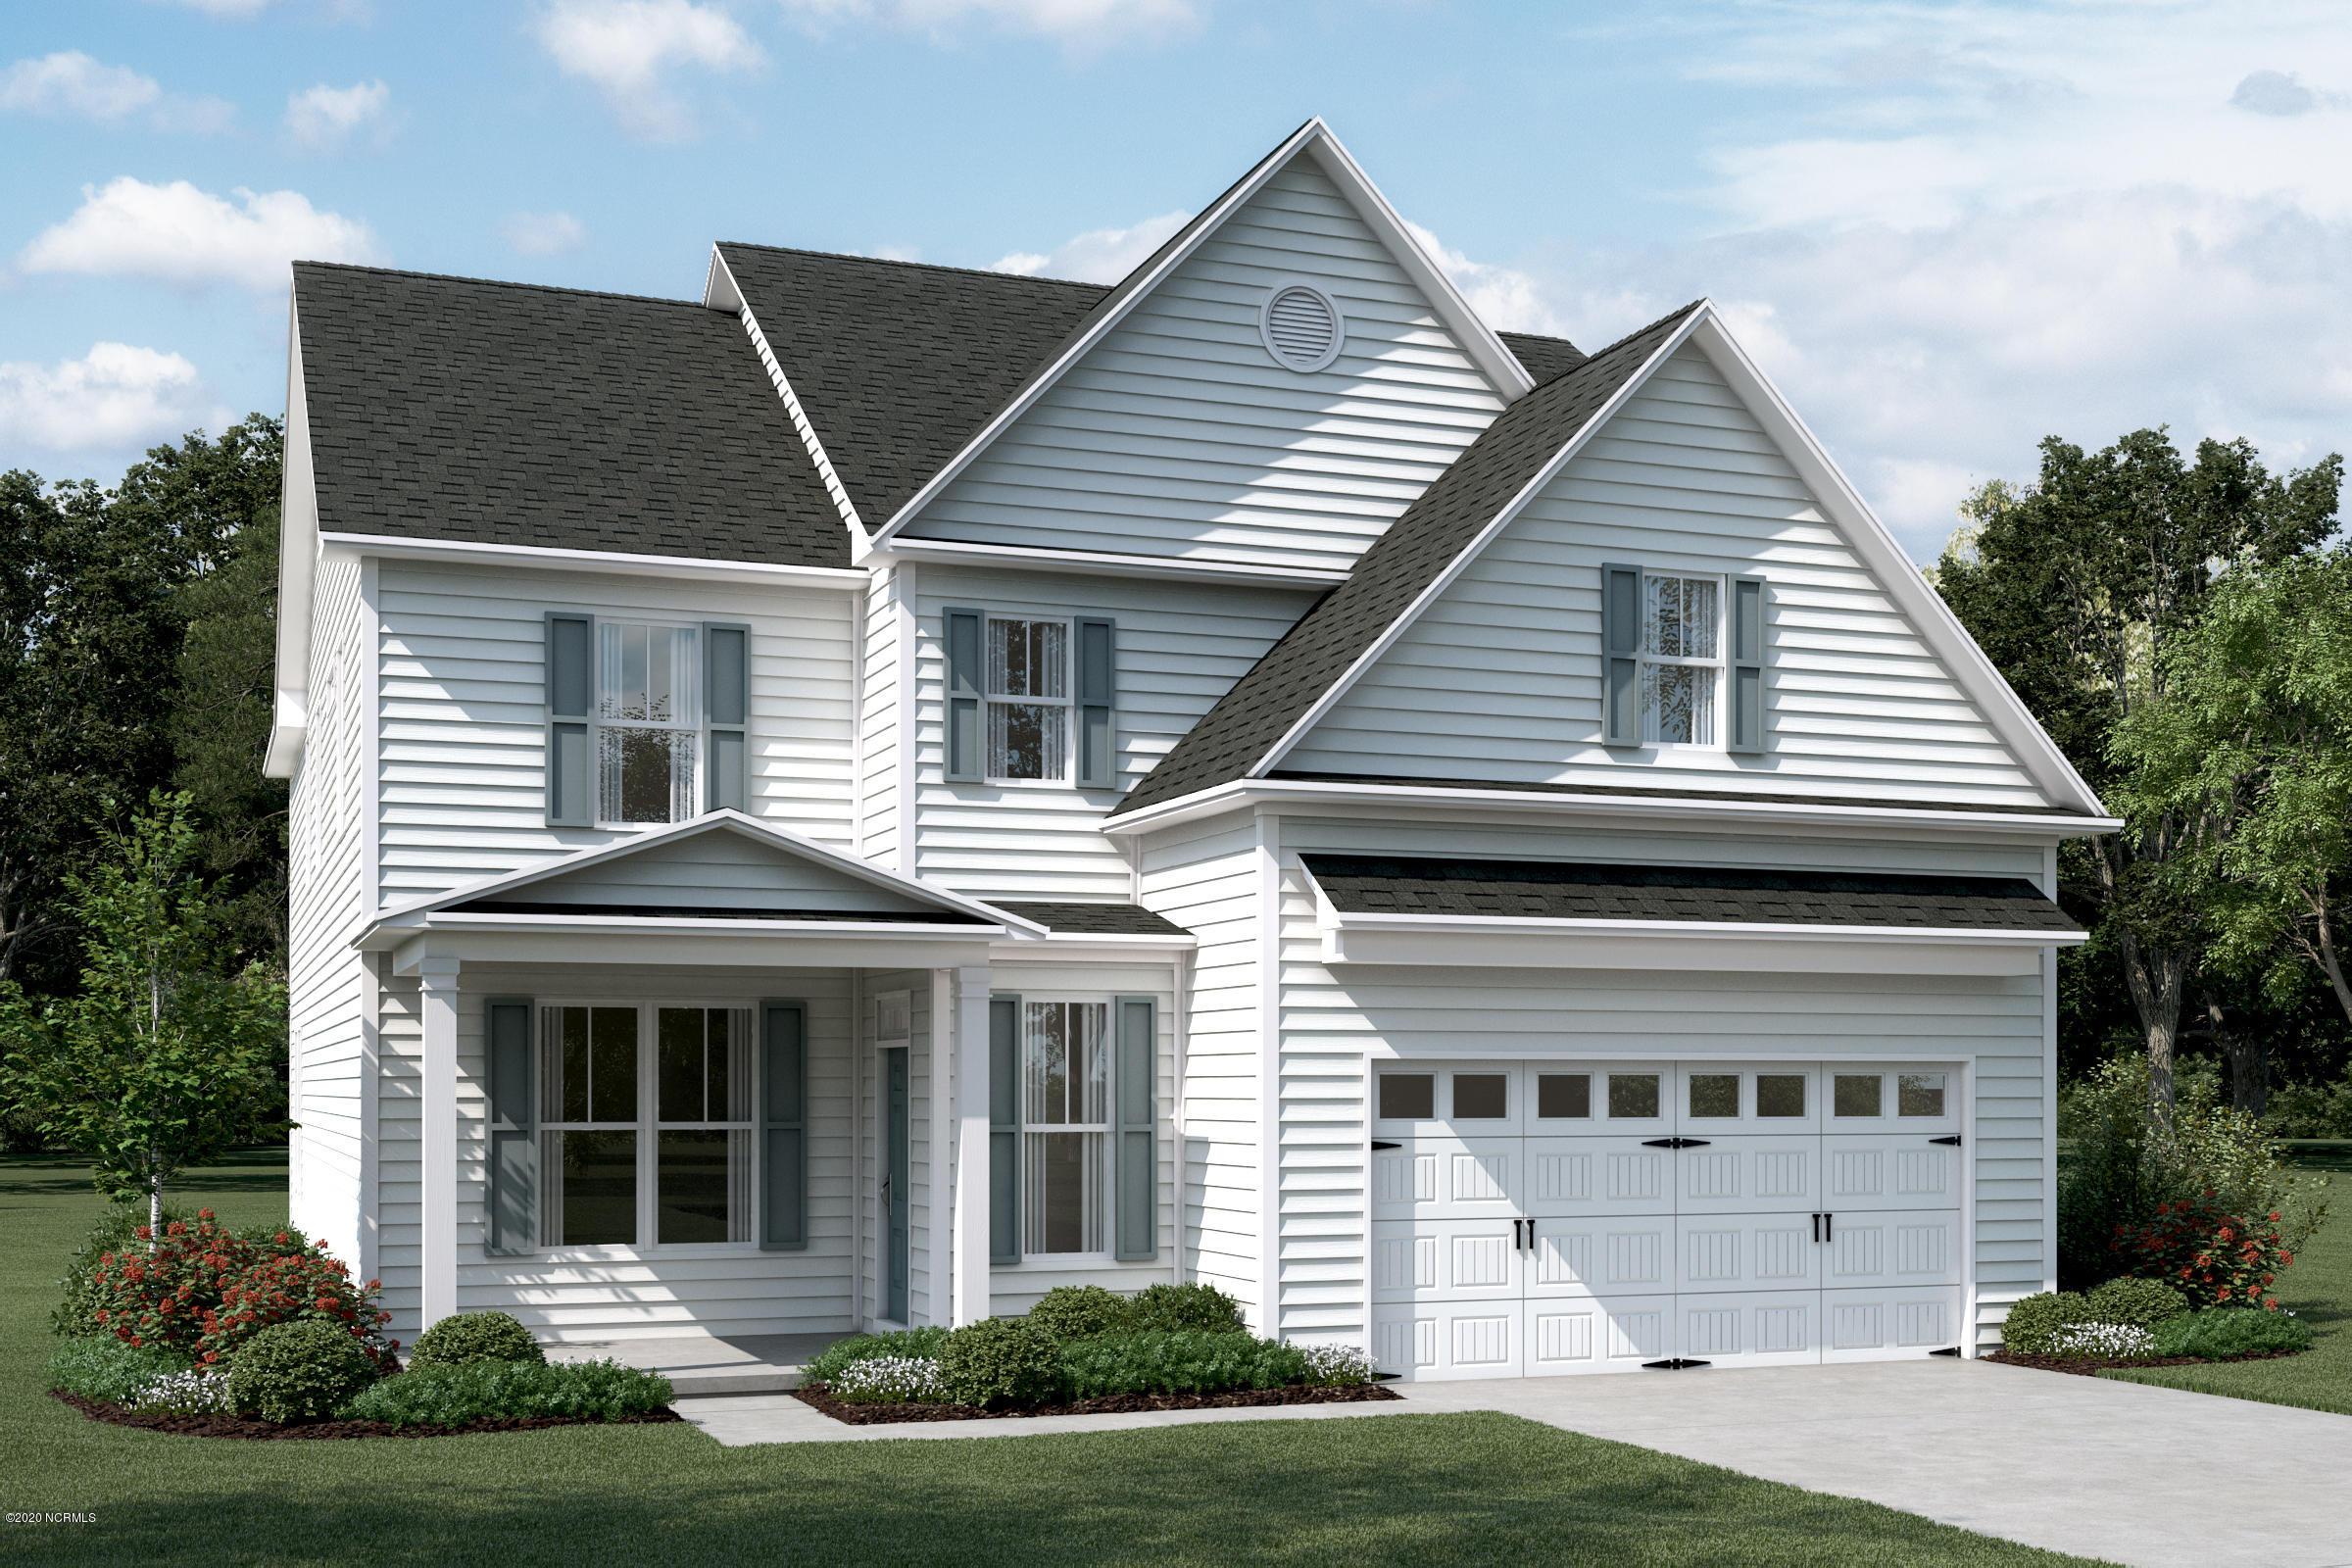 1137 Needleleaf Drive, Winnabow, North Carolina 28479, 5 Bedrooms Bedrooms, ,3 BathroomsBathrooms,Residential,For Sale,Needleleaf,100226899